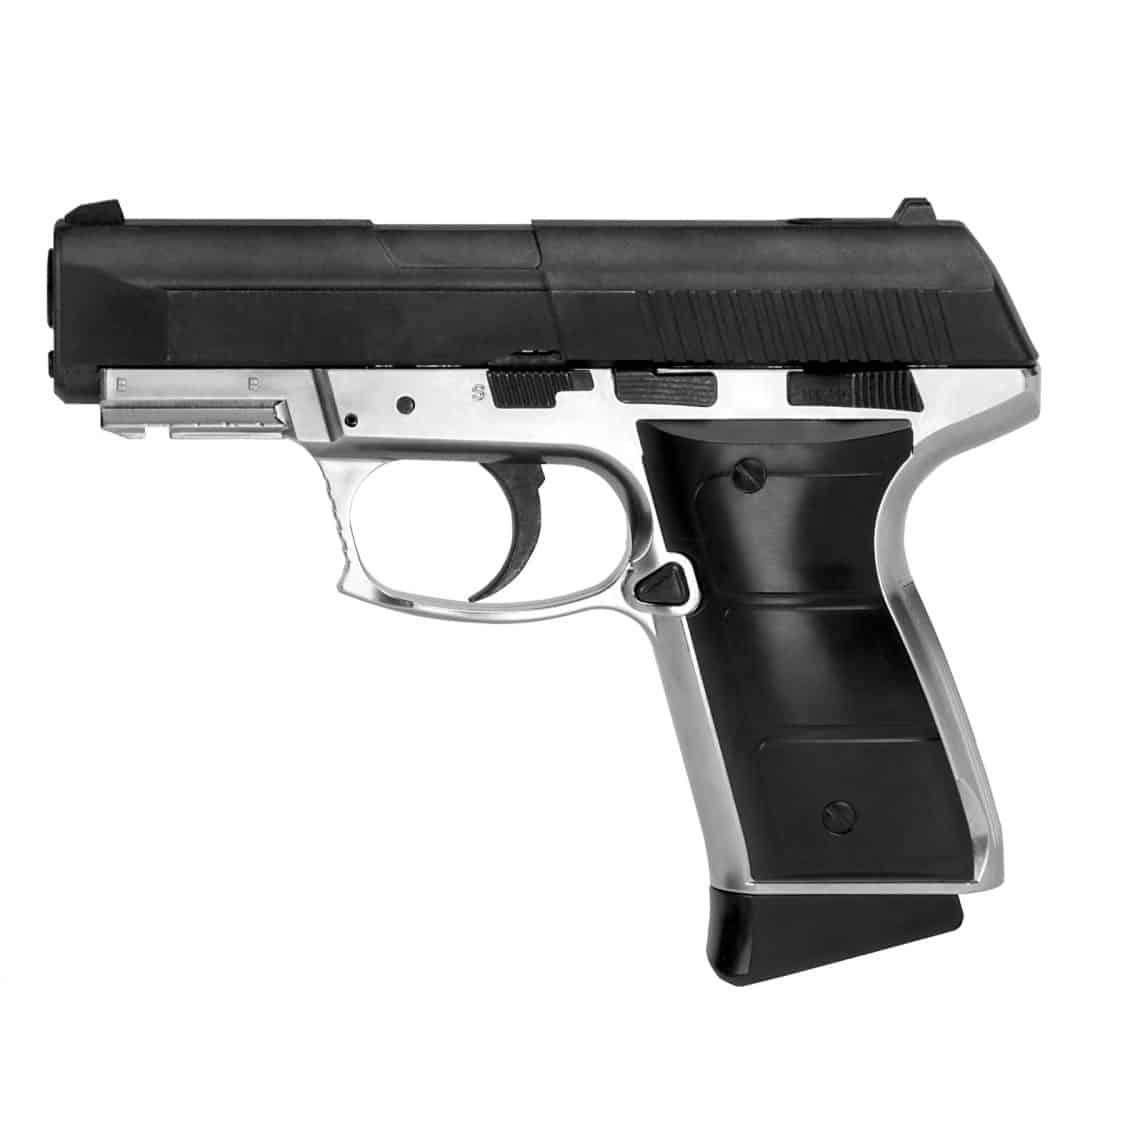 hight resolution of daisy powerline 5501 blowback co2 semi automatic bb gun